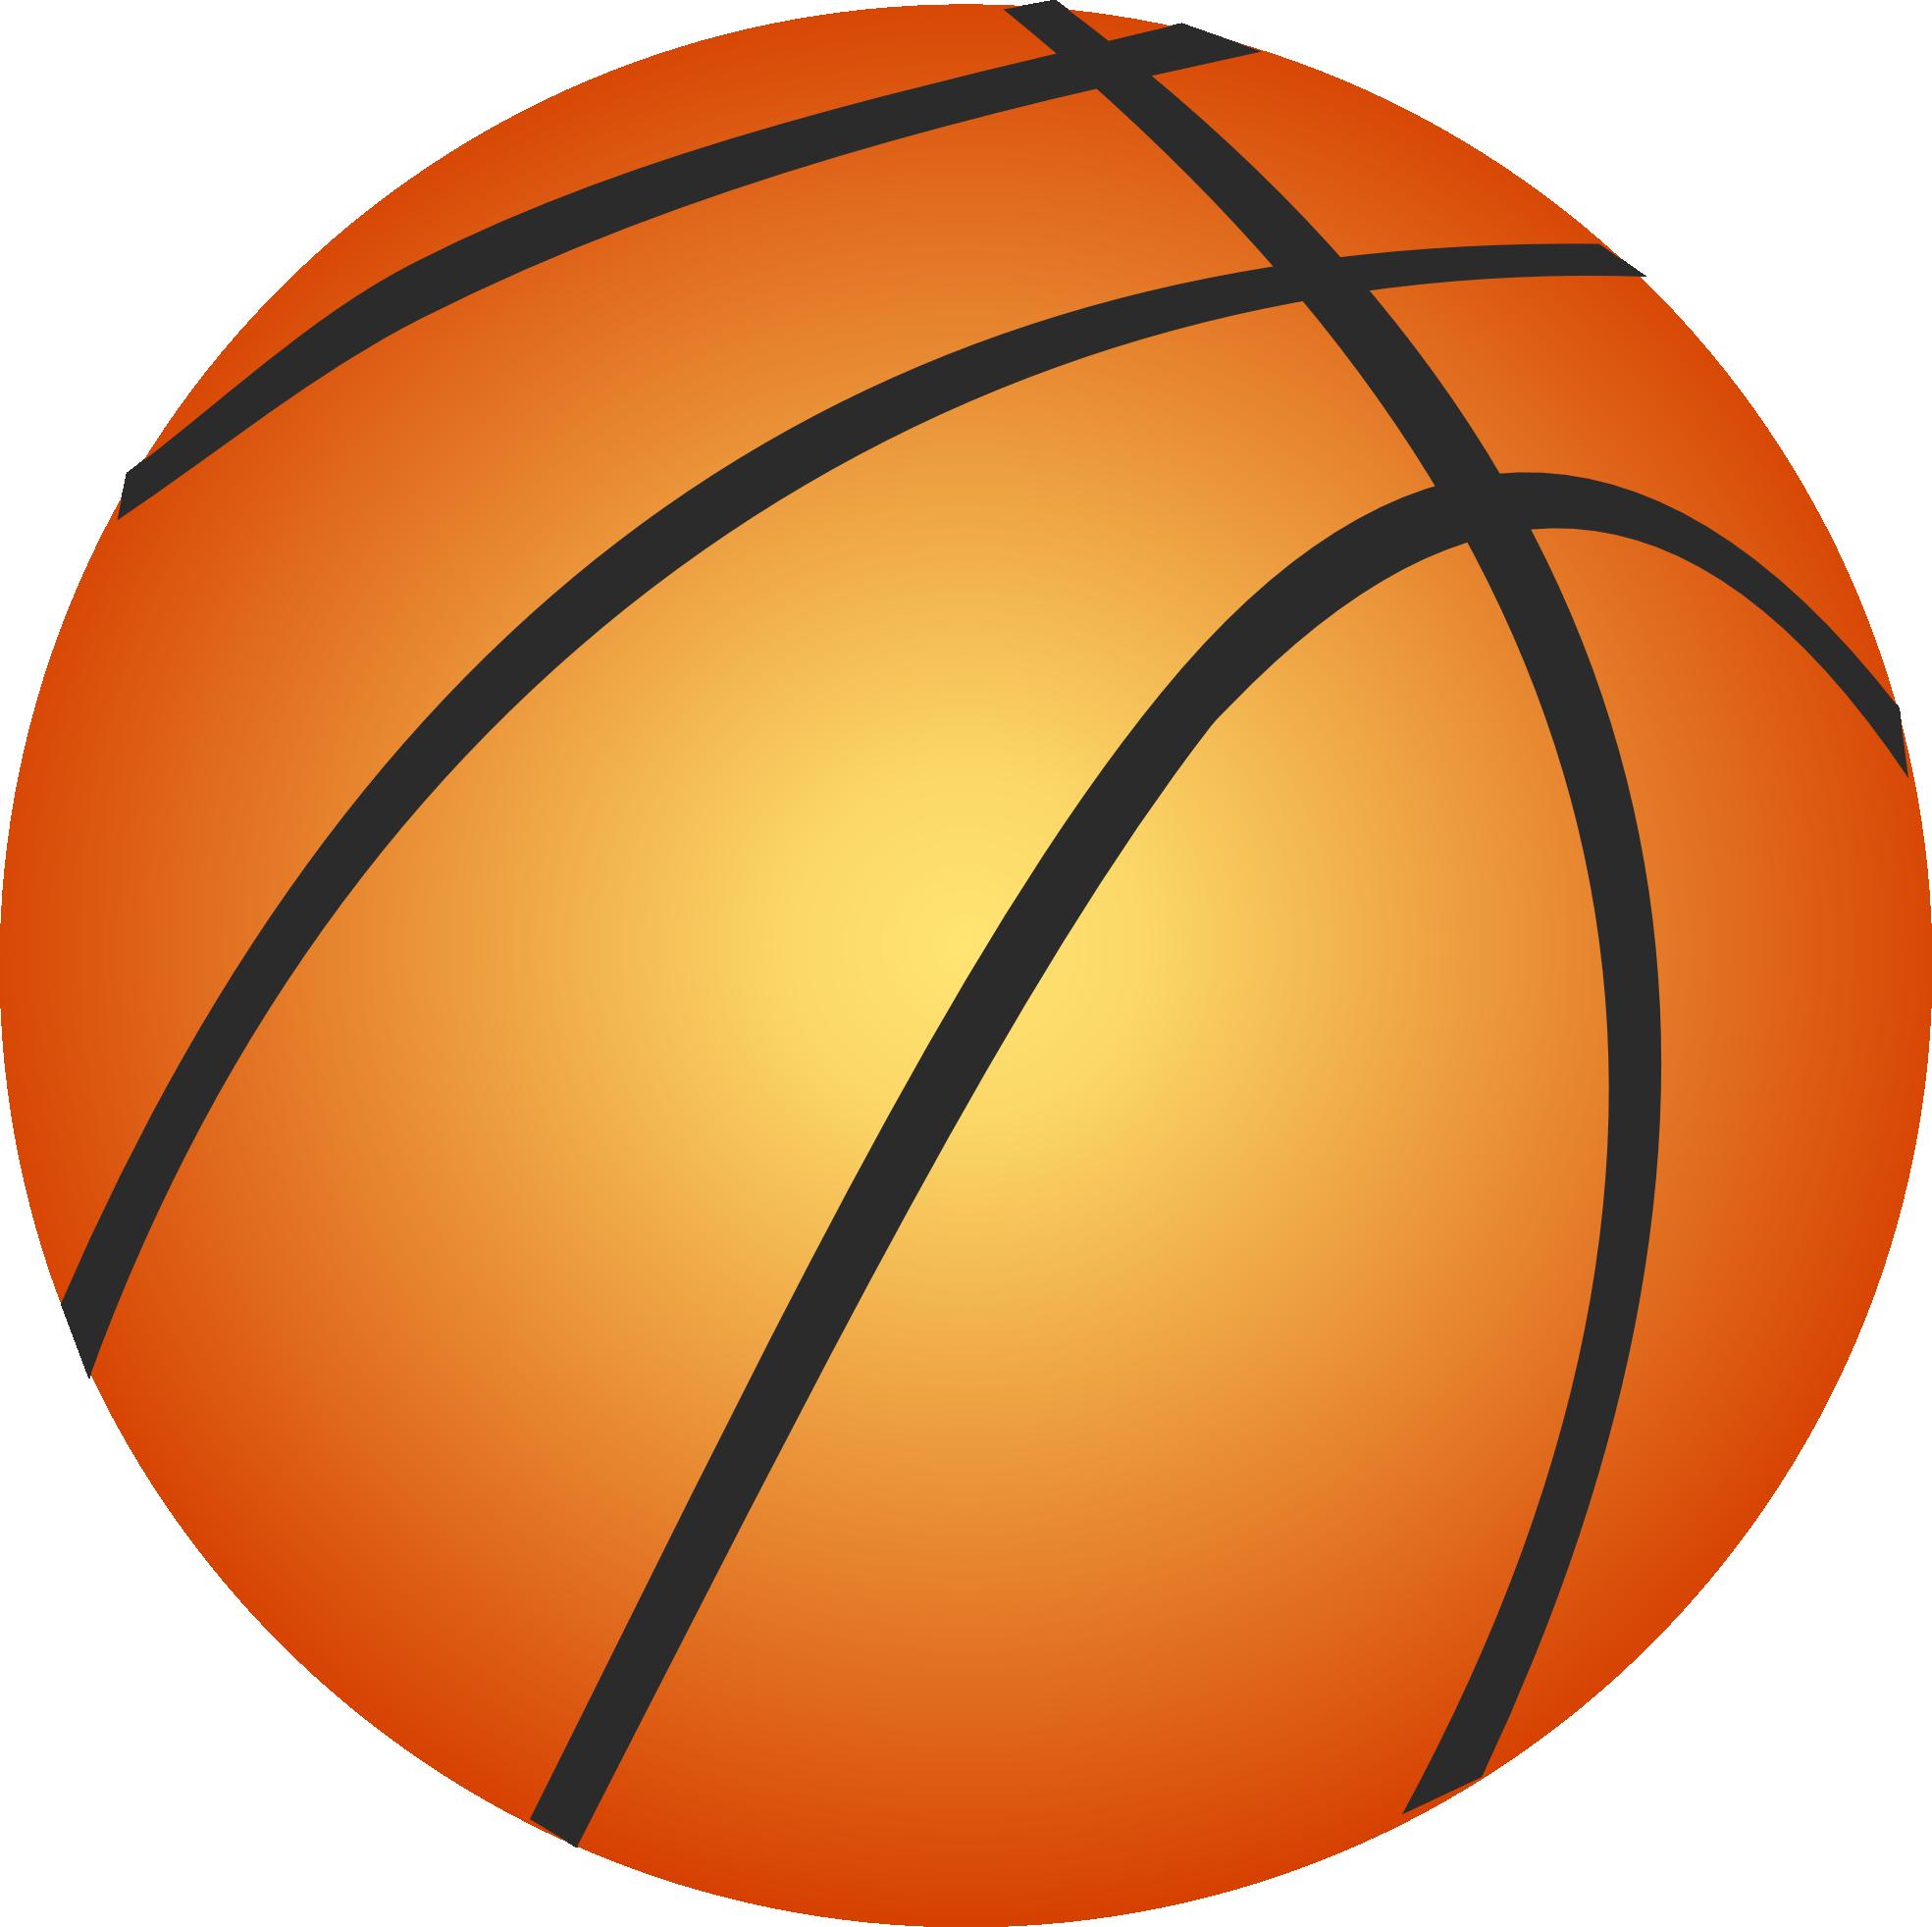 freeuse Basket ball . Books clipart basketball